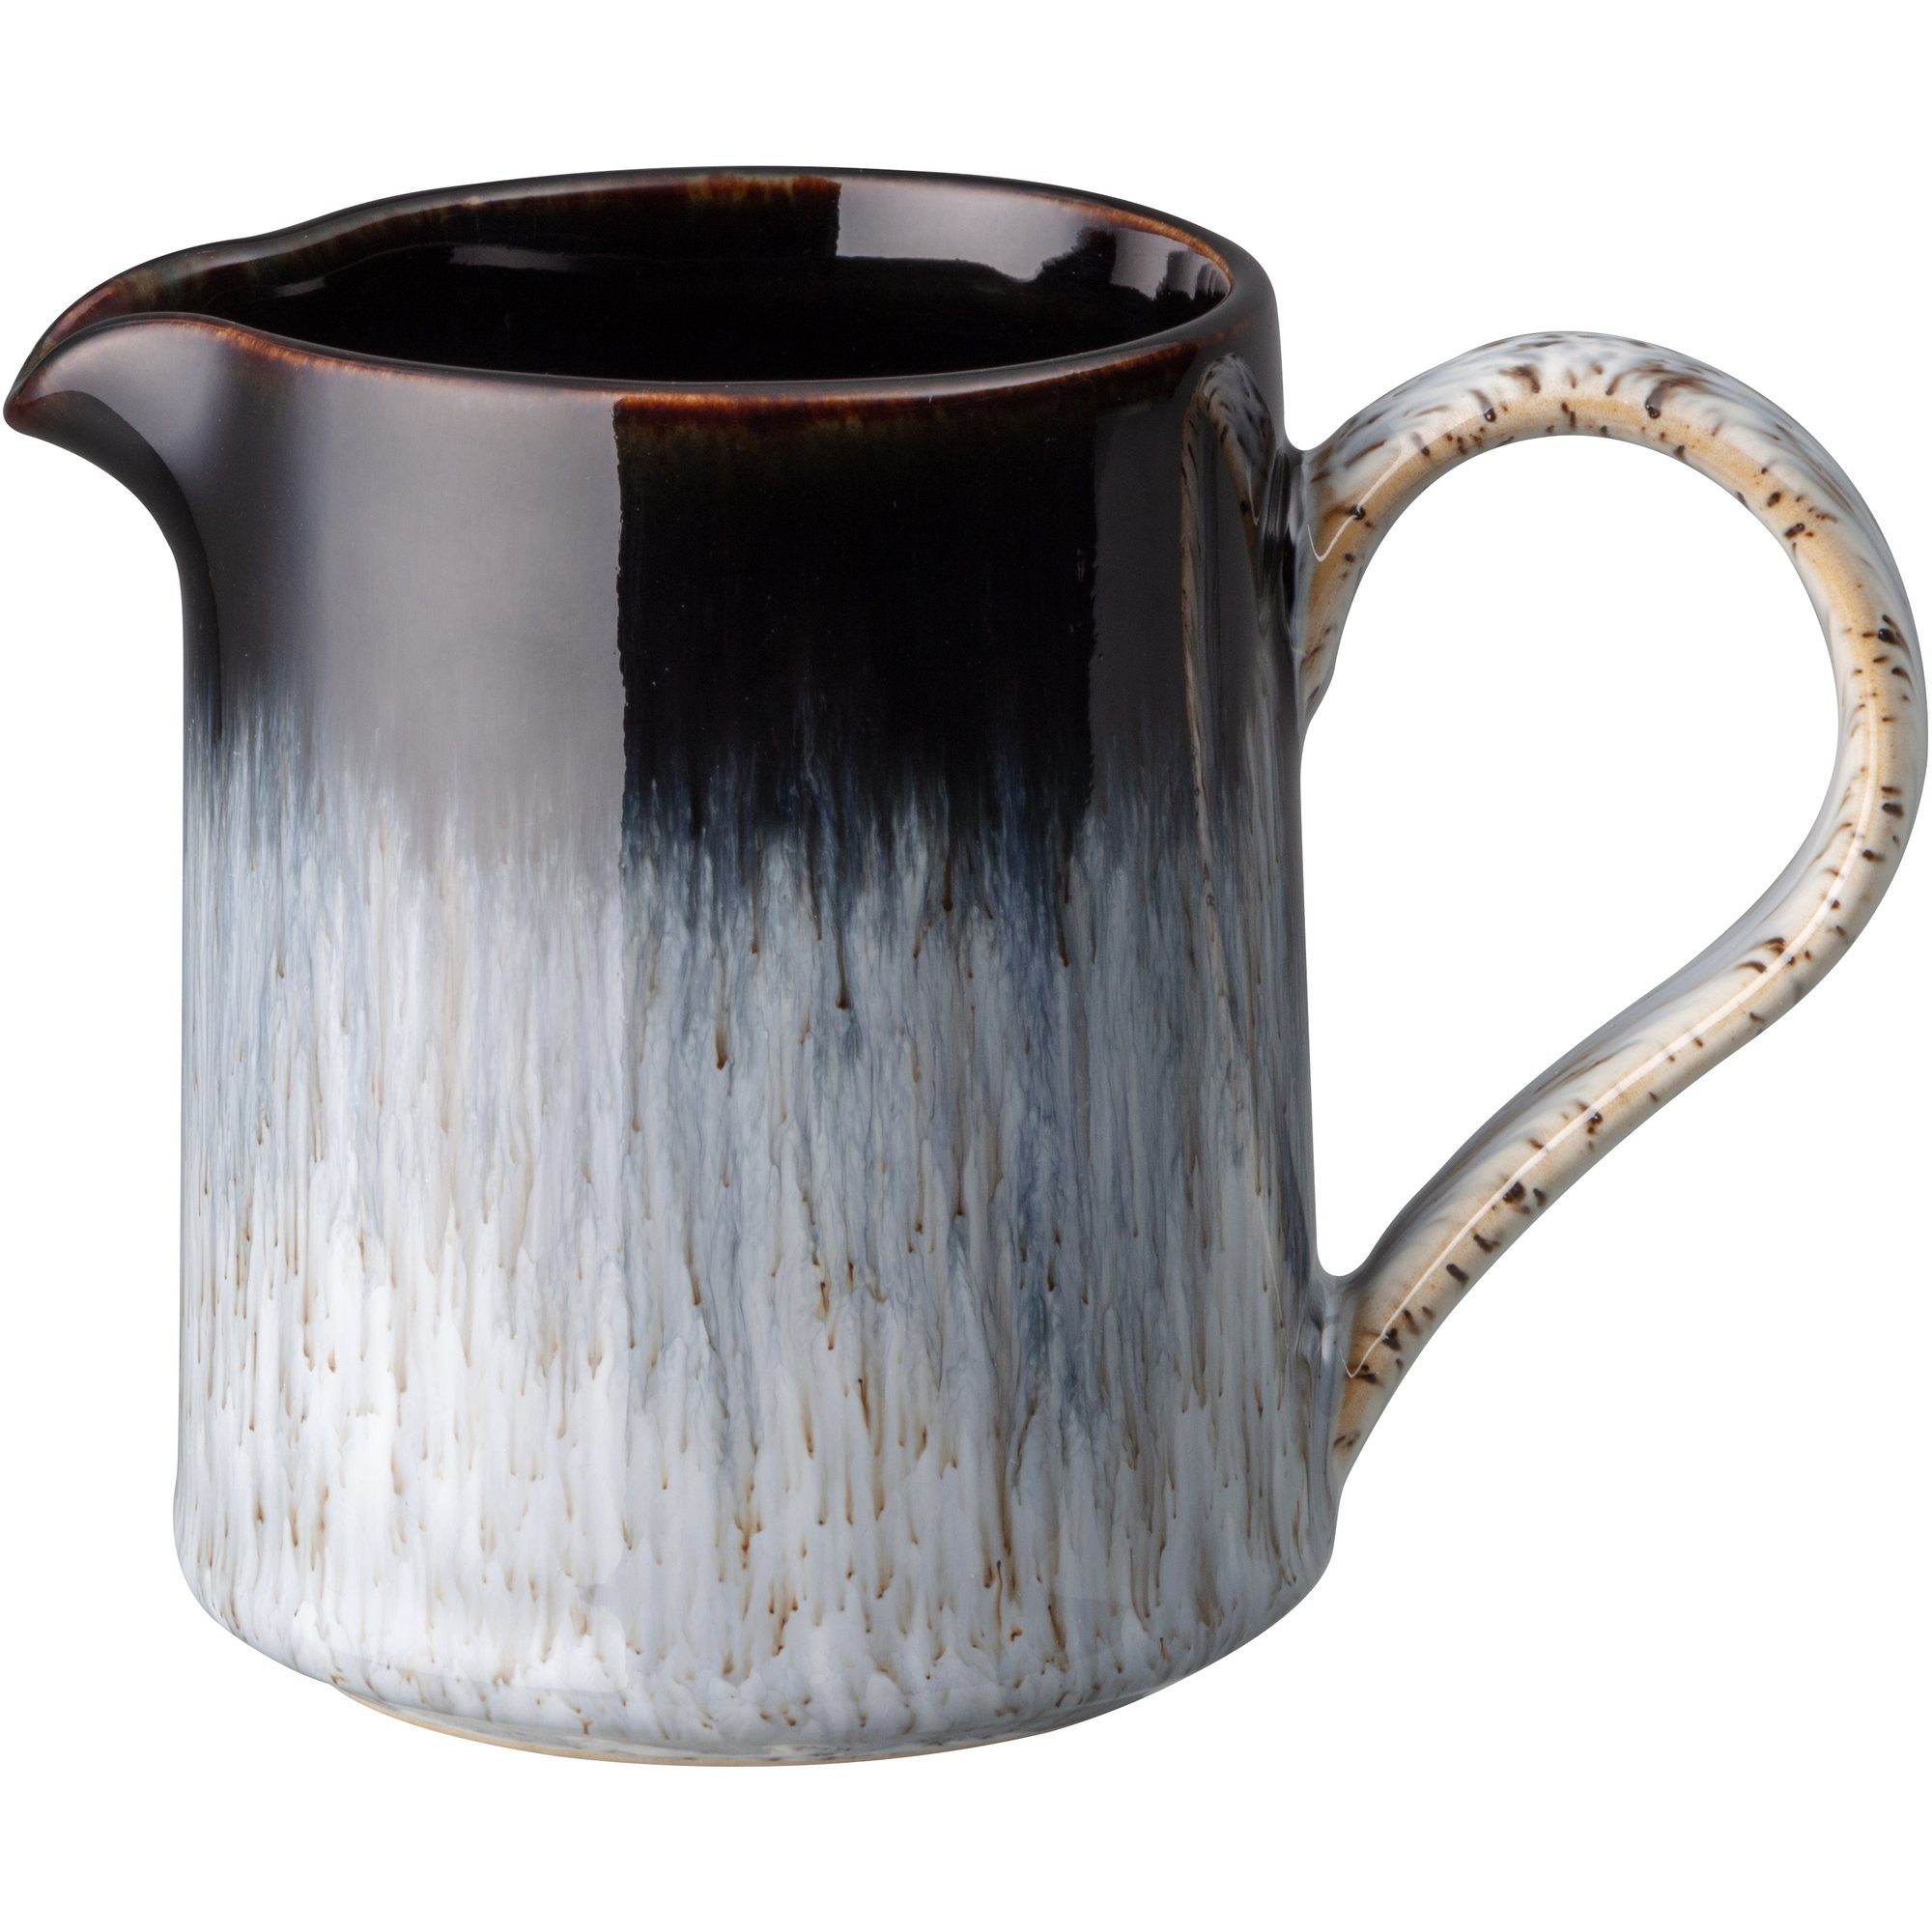 Denby Halo Brew Kanna 200 ml